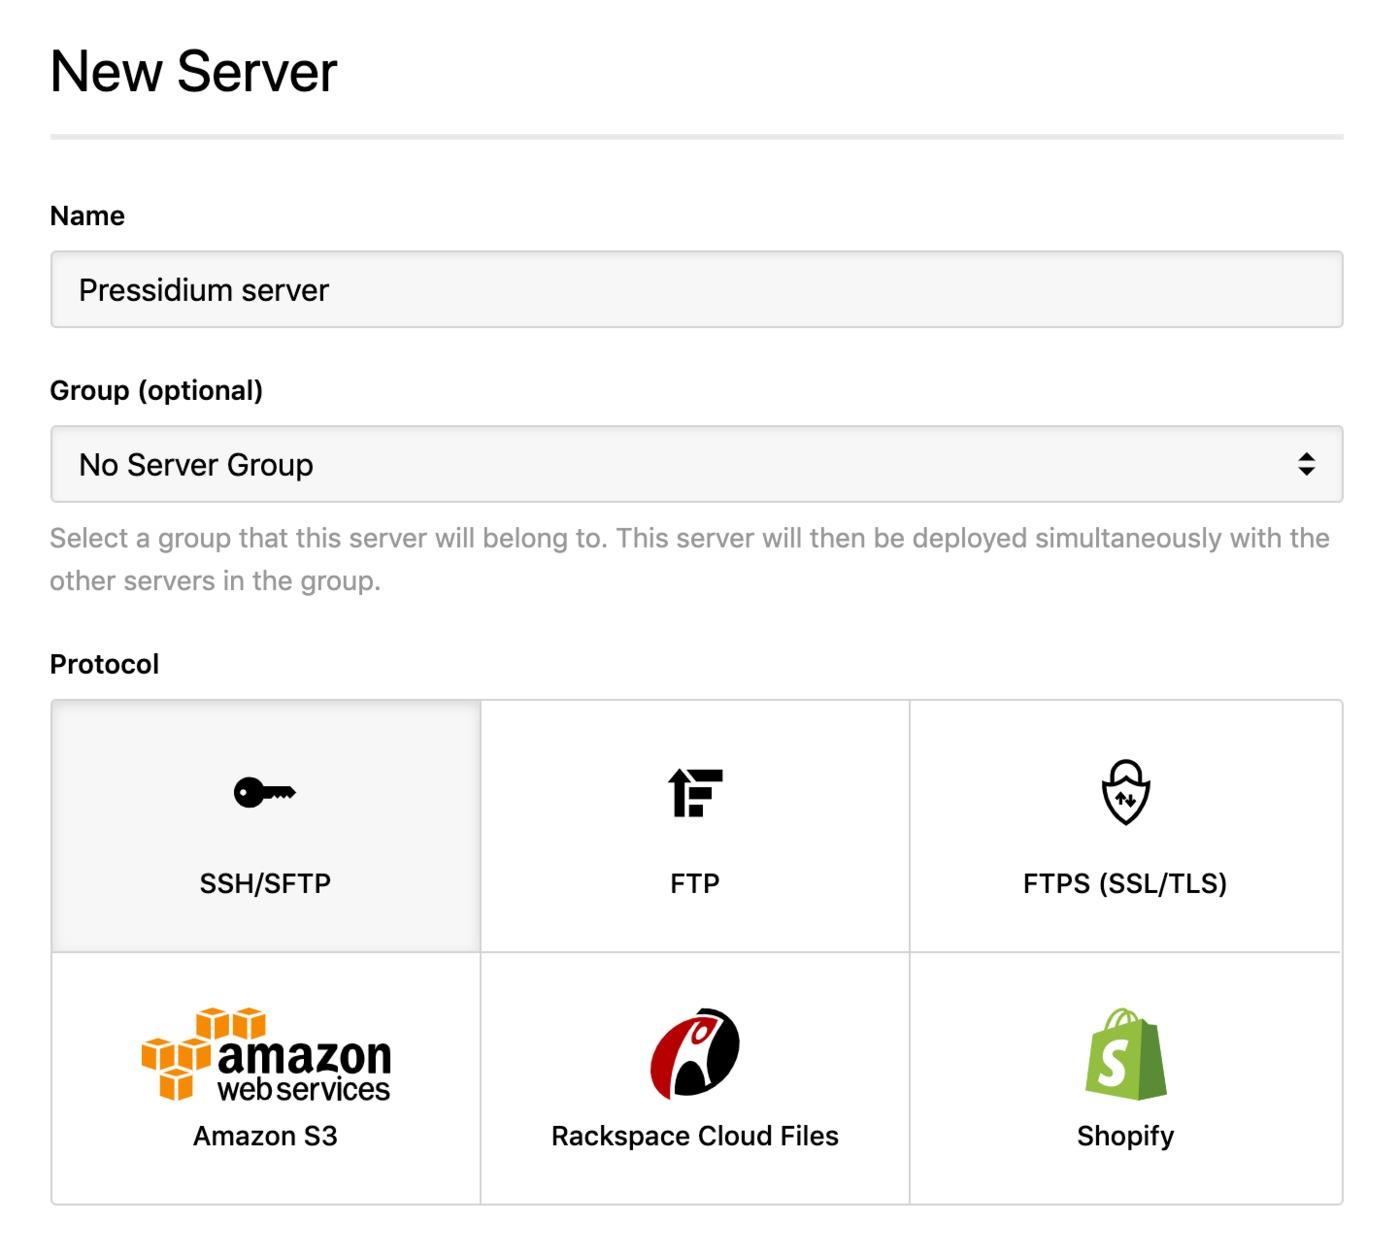 Pressidium - SSH server